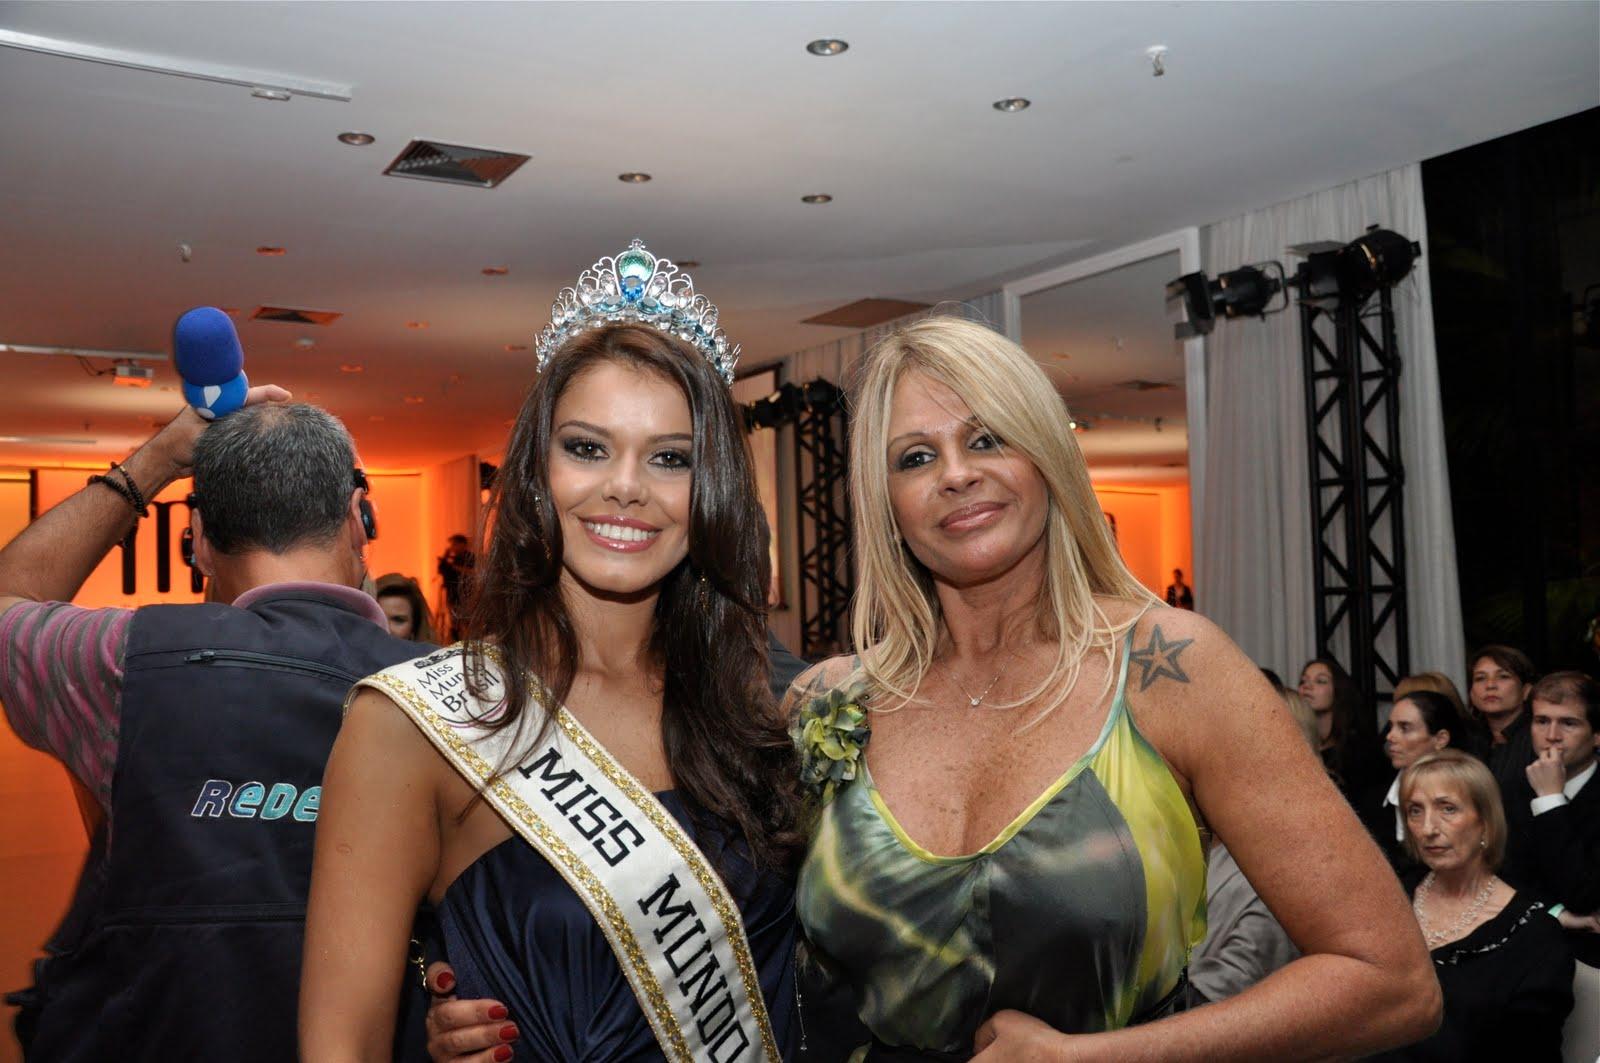 miss mundo brasil 2009, luciana bertolini.  Yxelc3xb